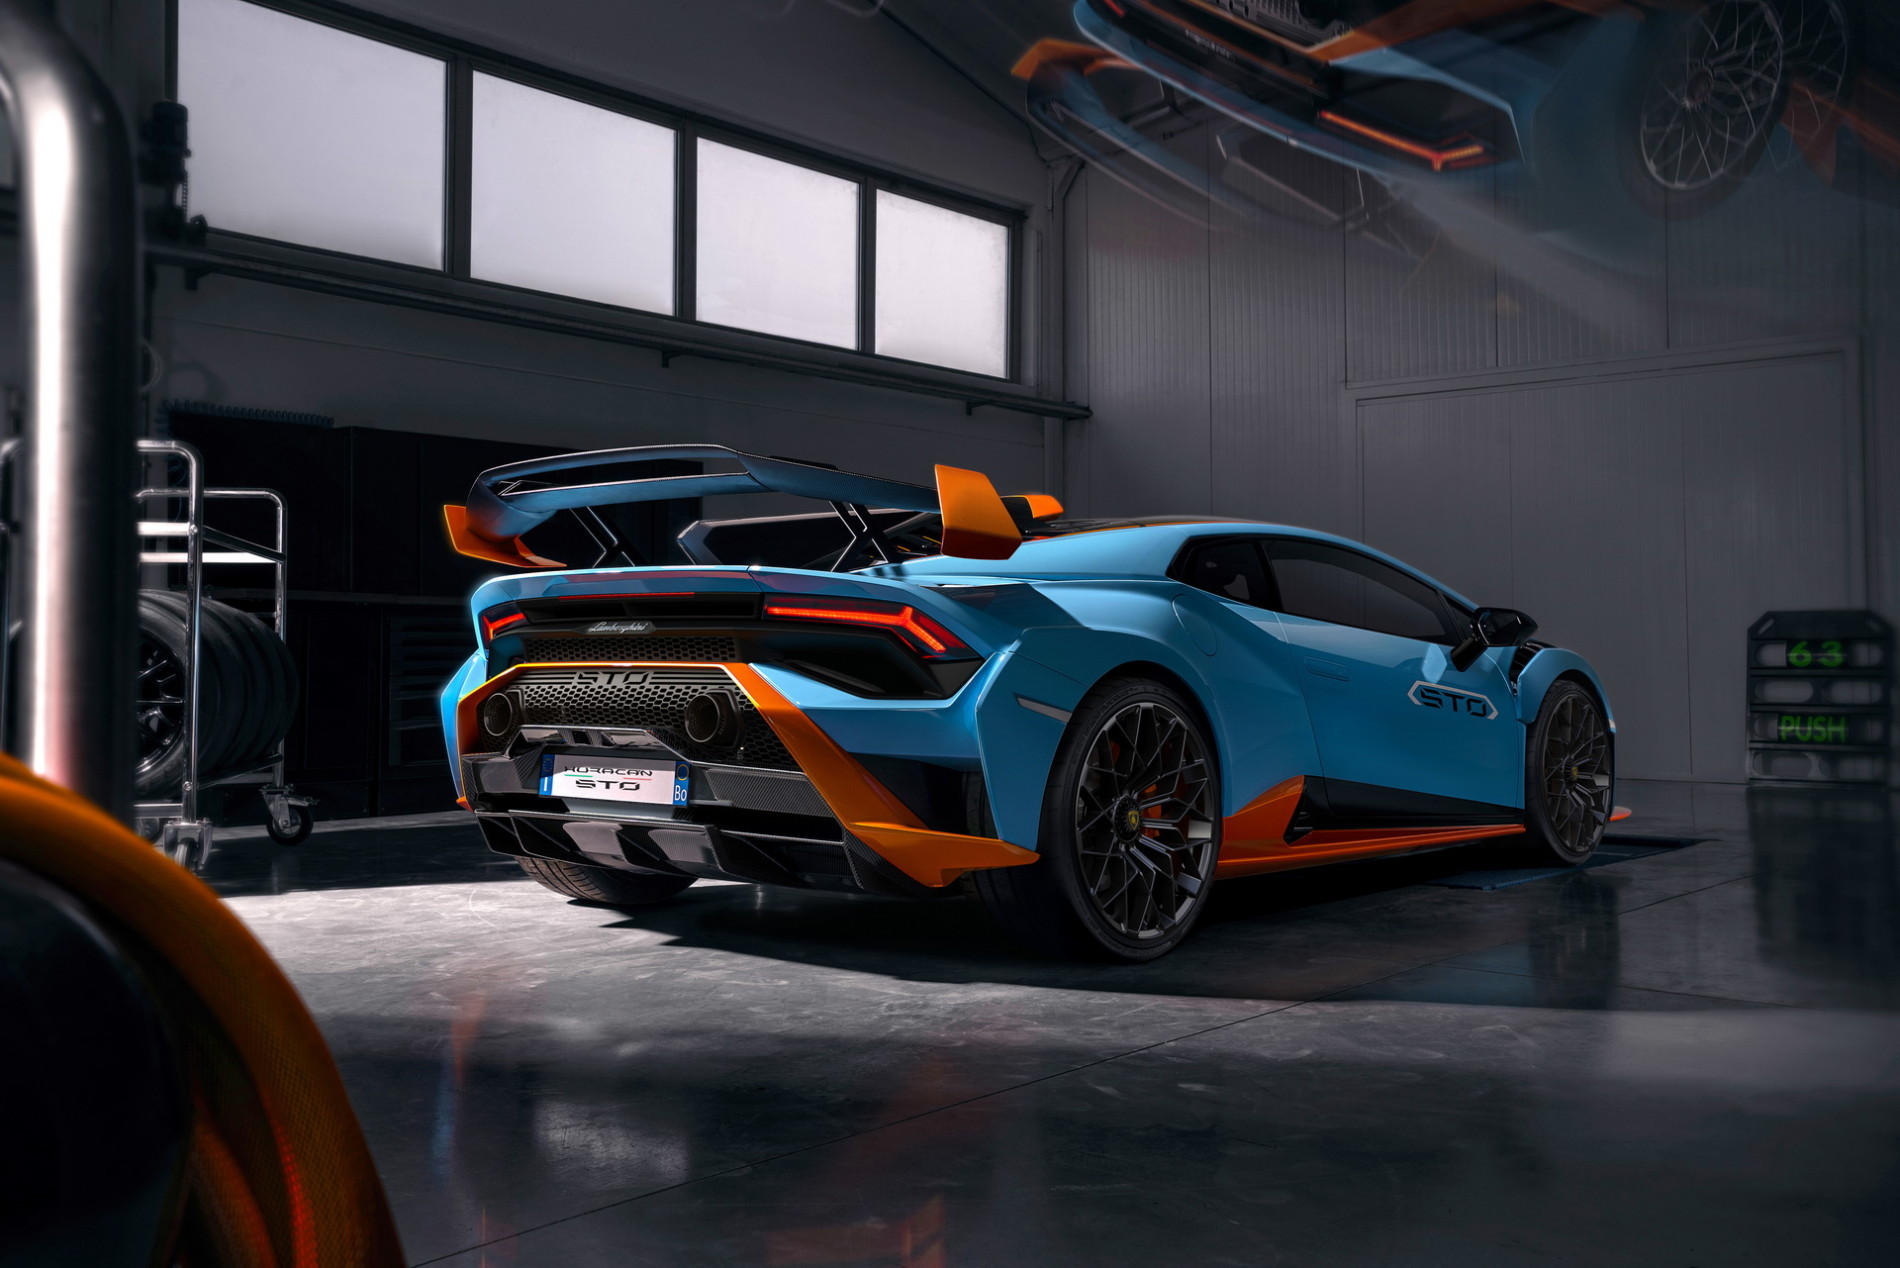 Lamborghini Huracan STO - Lamborghini Huracan STO